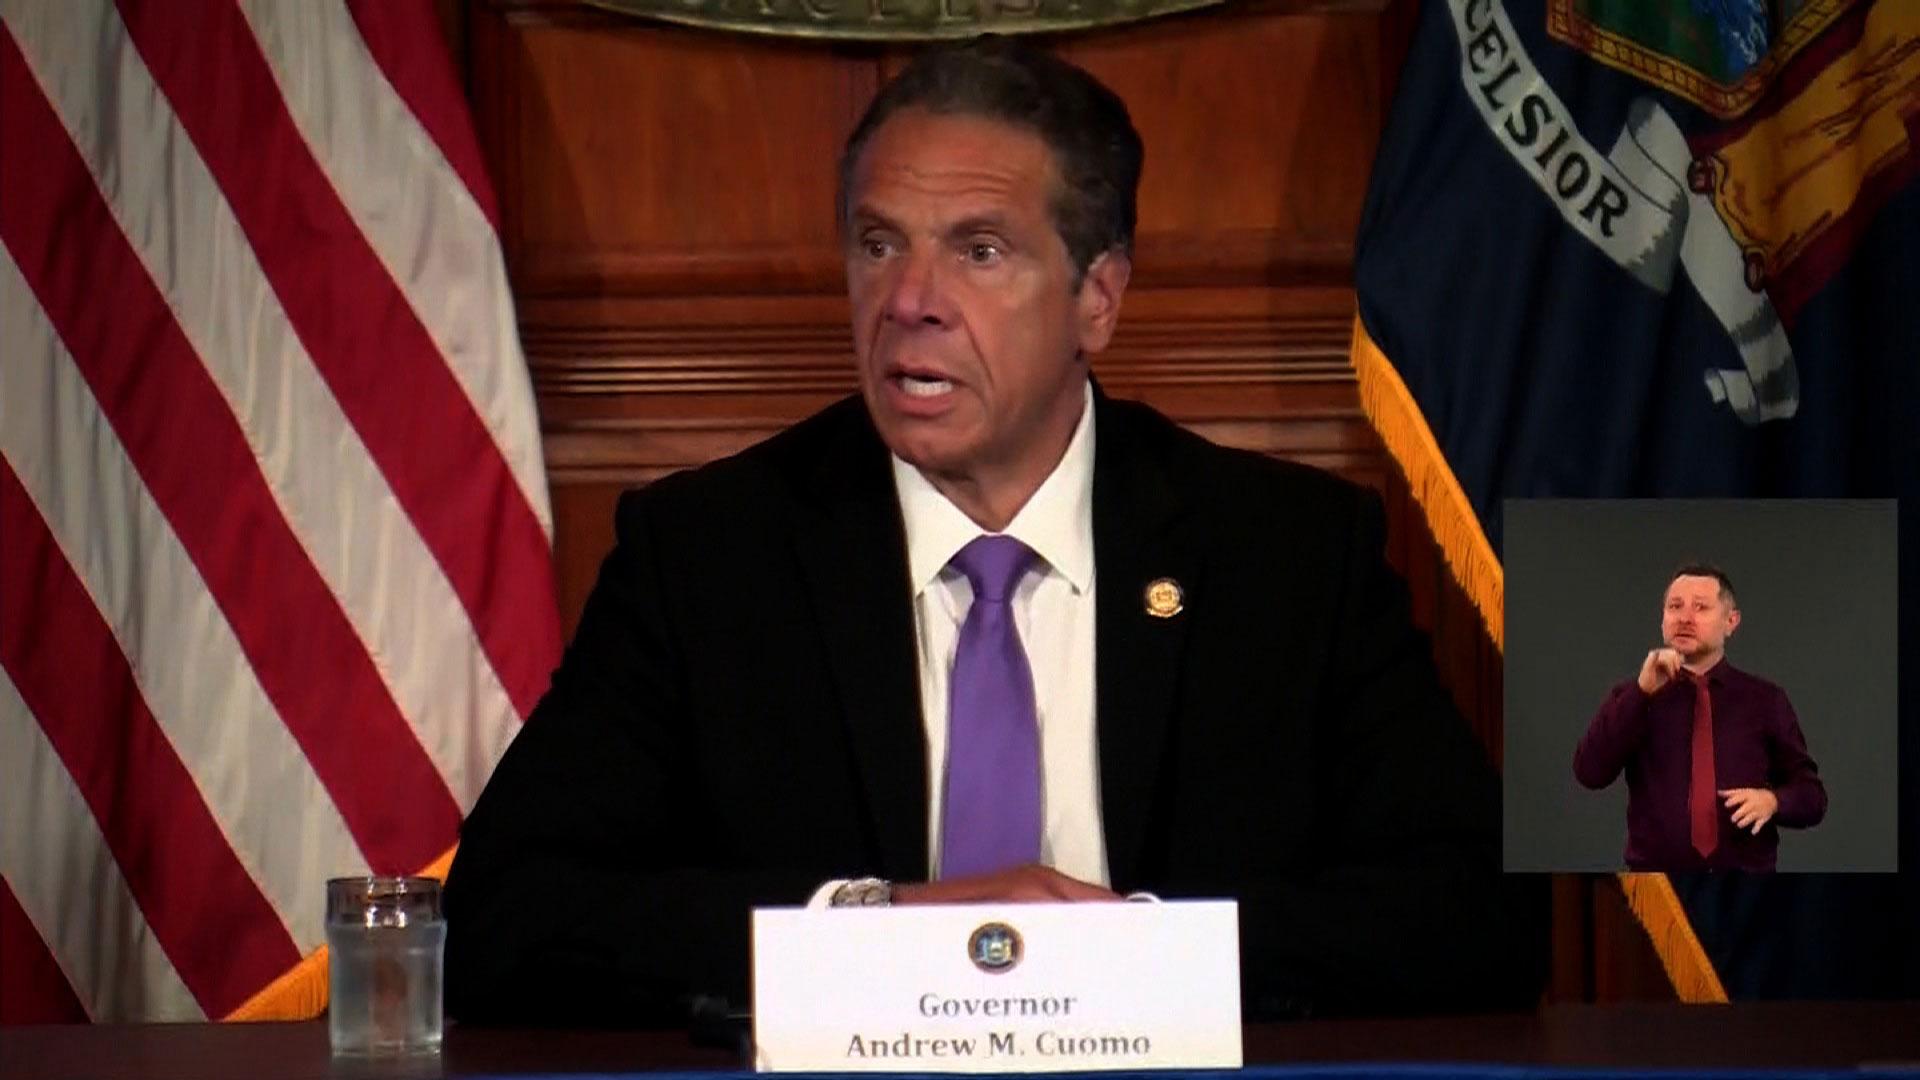 New York Gov. Andrew Cuomo speaks during a coronavirus briefing in Albany, New York, on June 2.